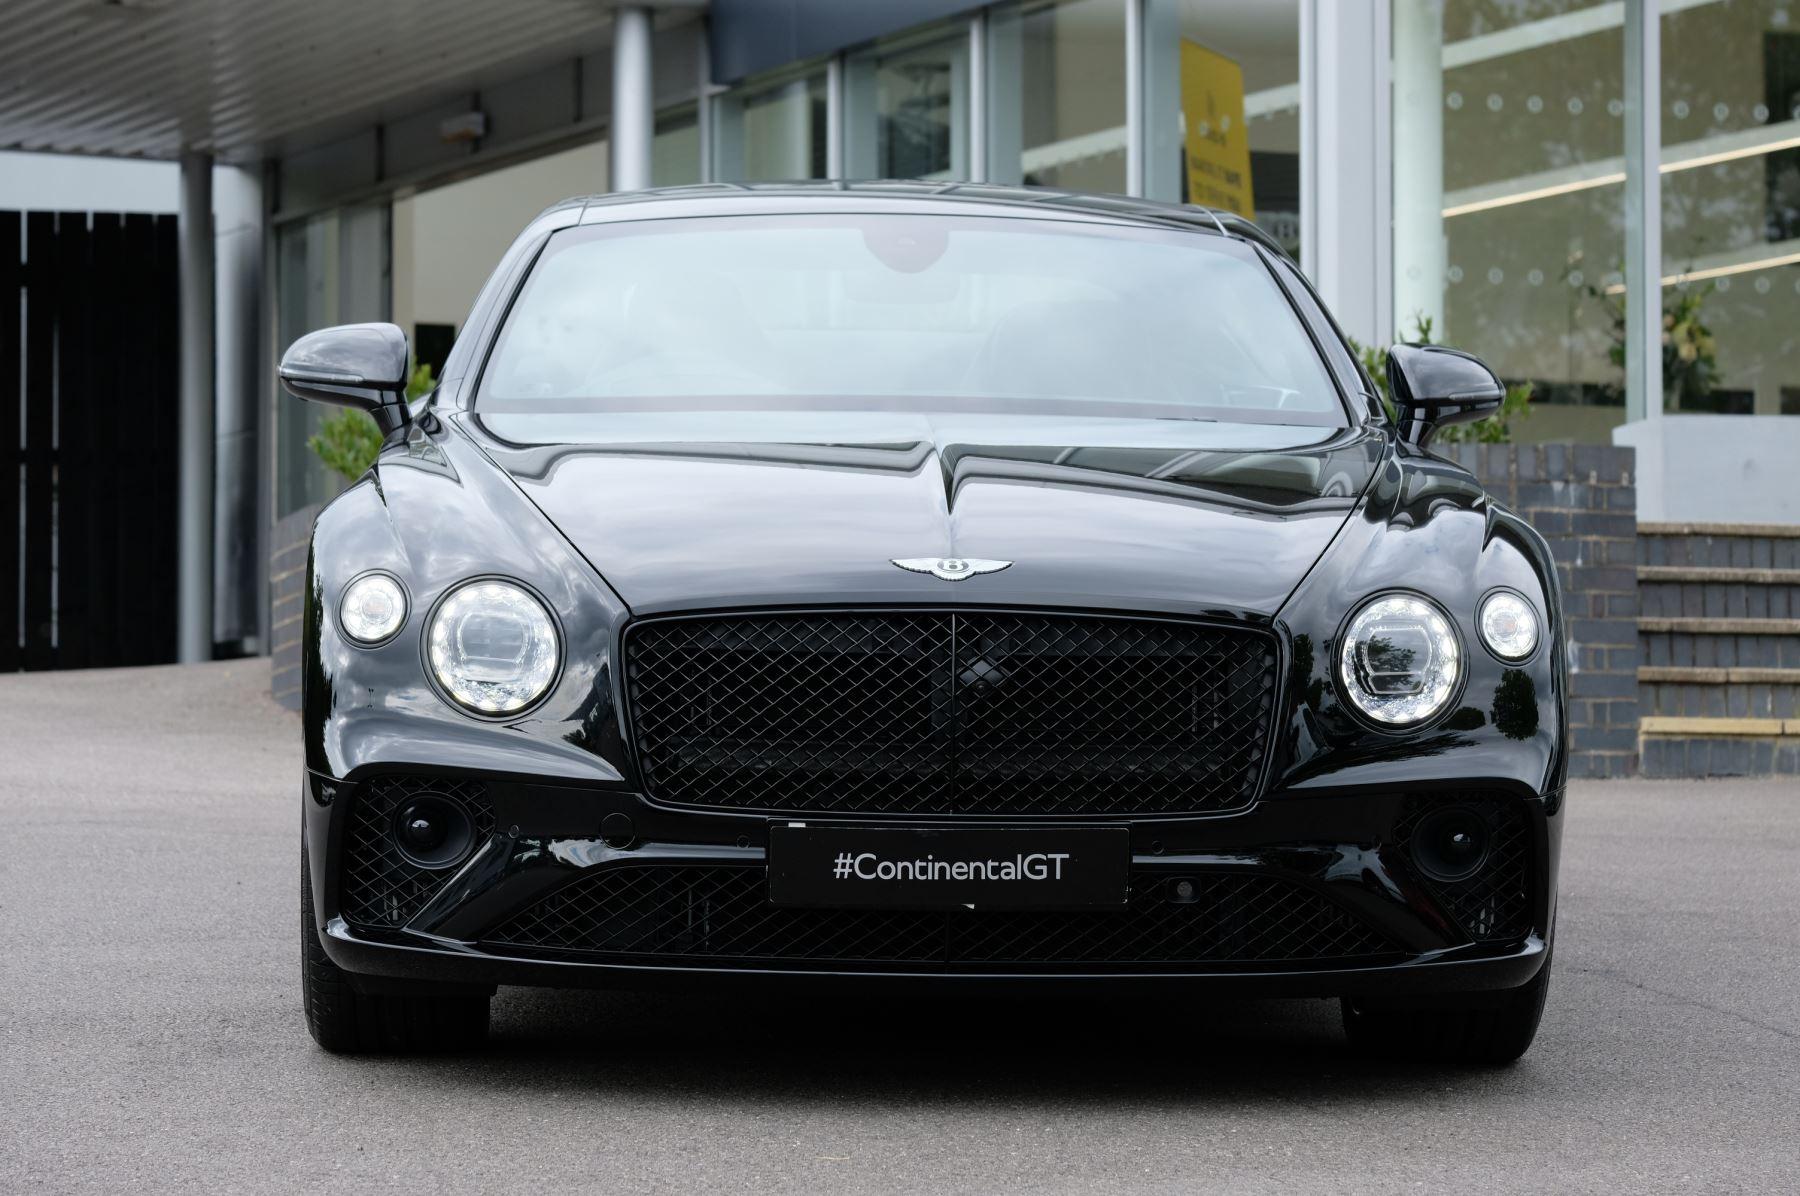 Bentley Continental GT V8 Mulliner Driving Specification image 3